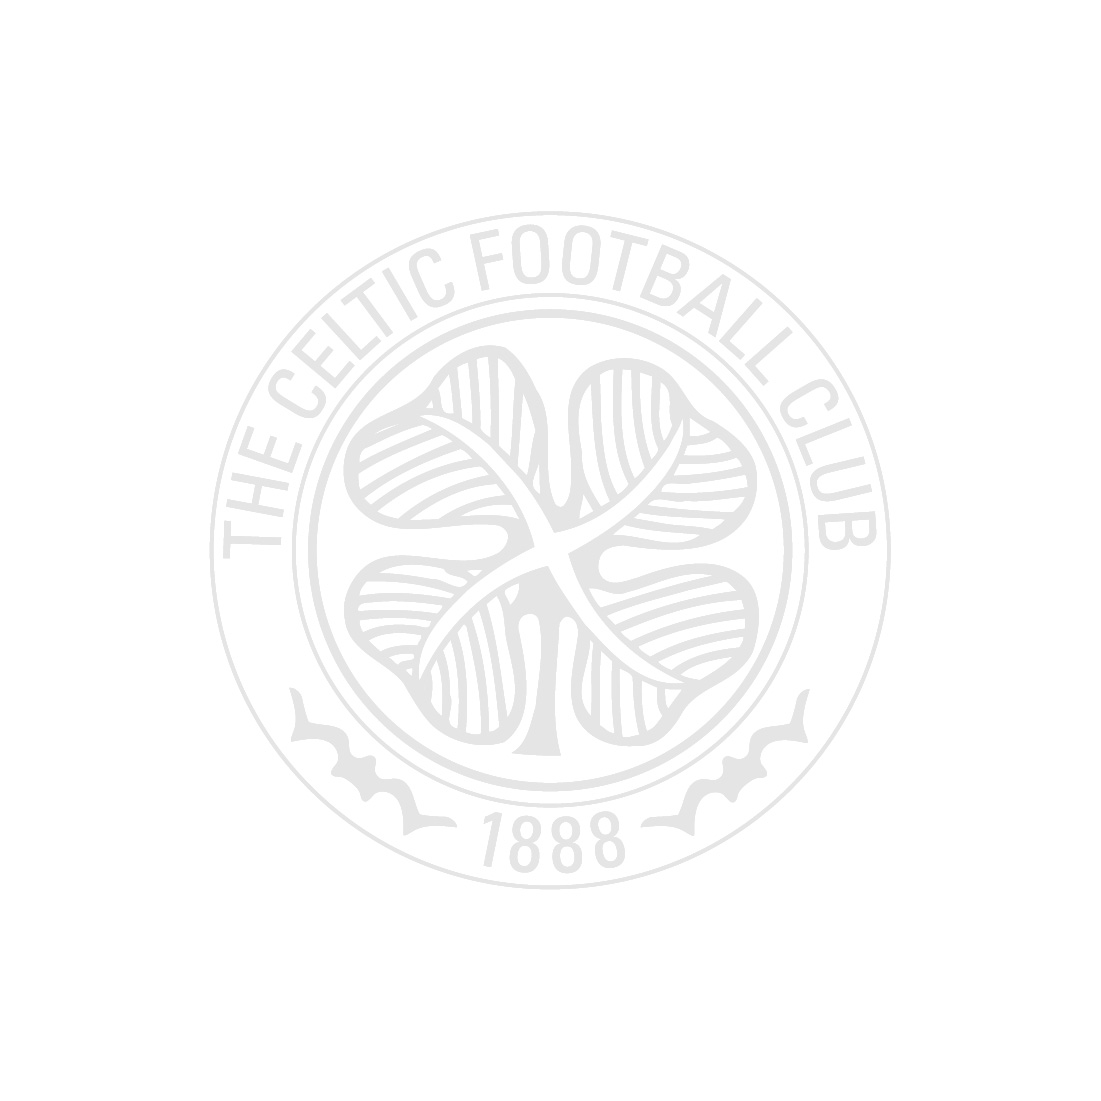 V-neck Graphic Ladies Celtic T-shirt